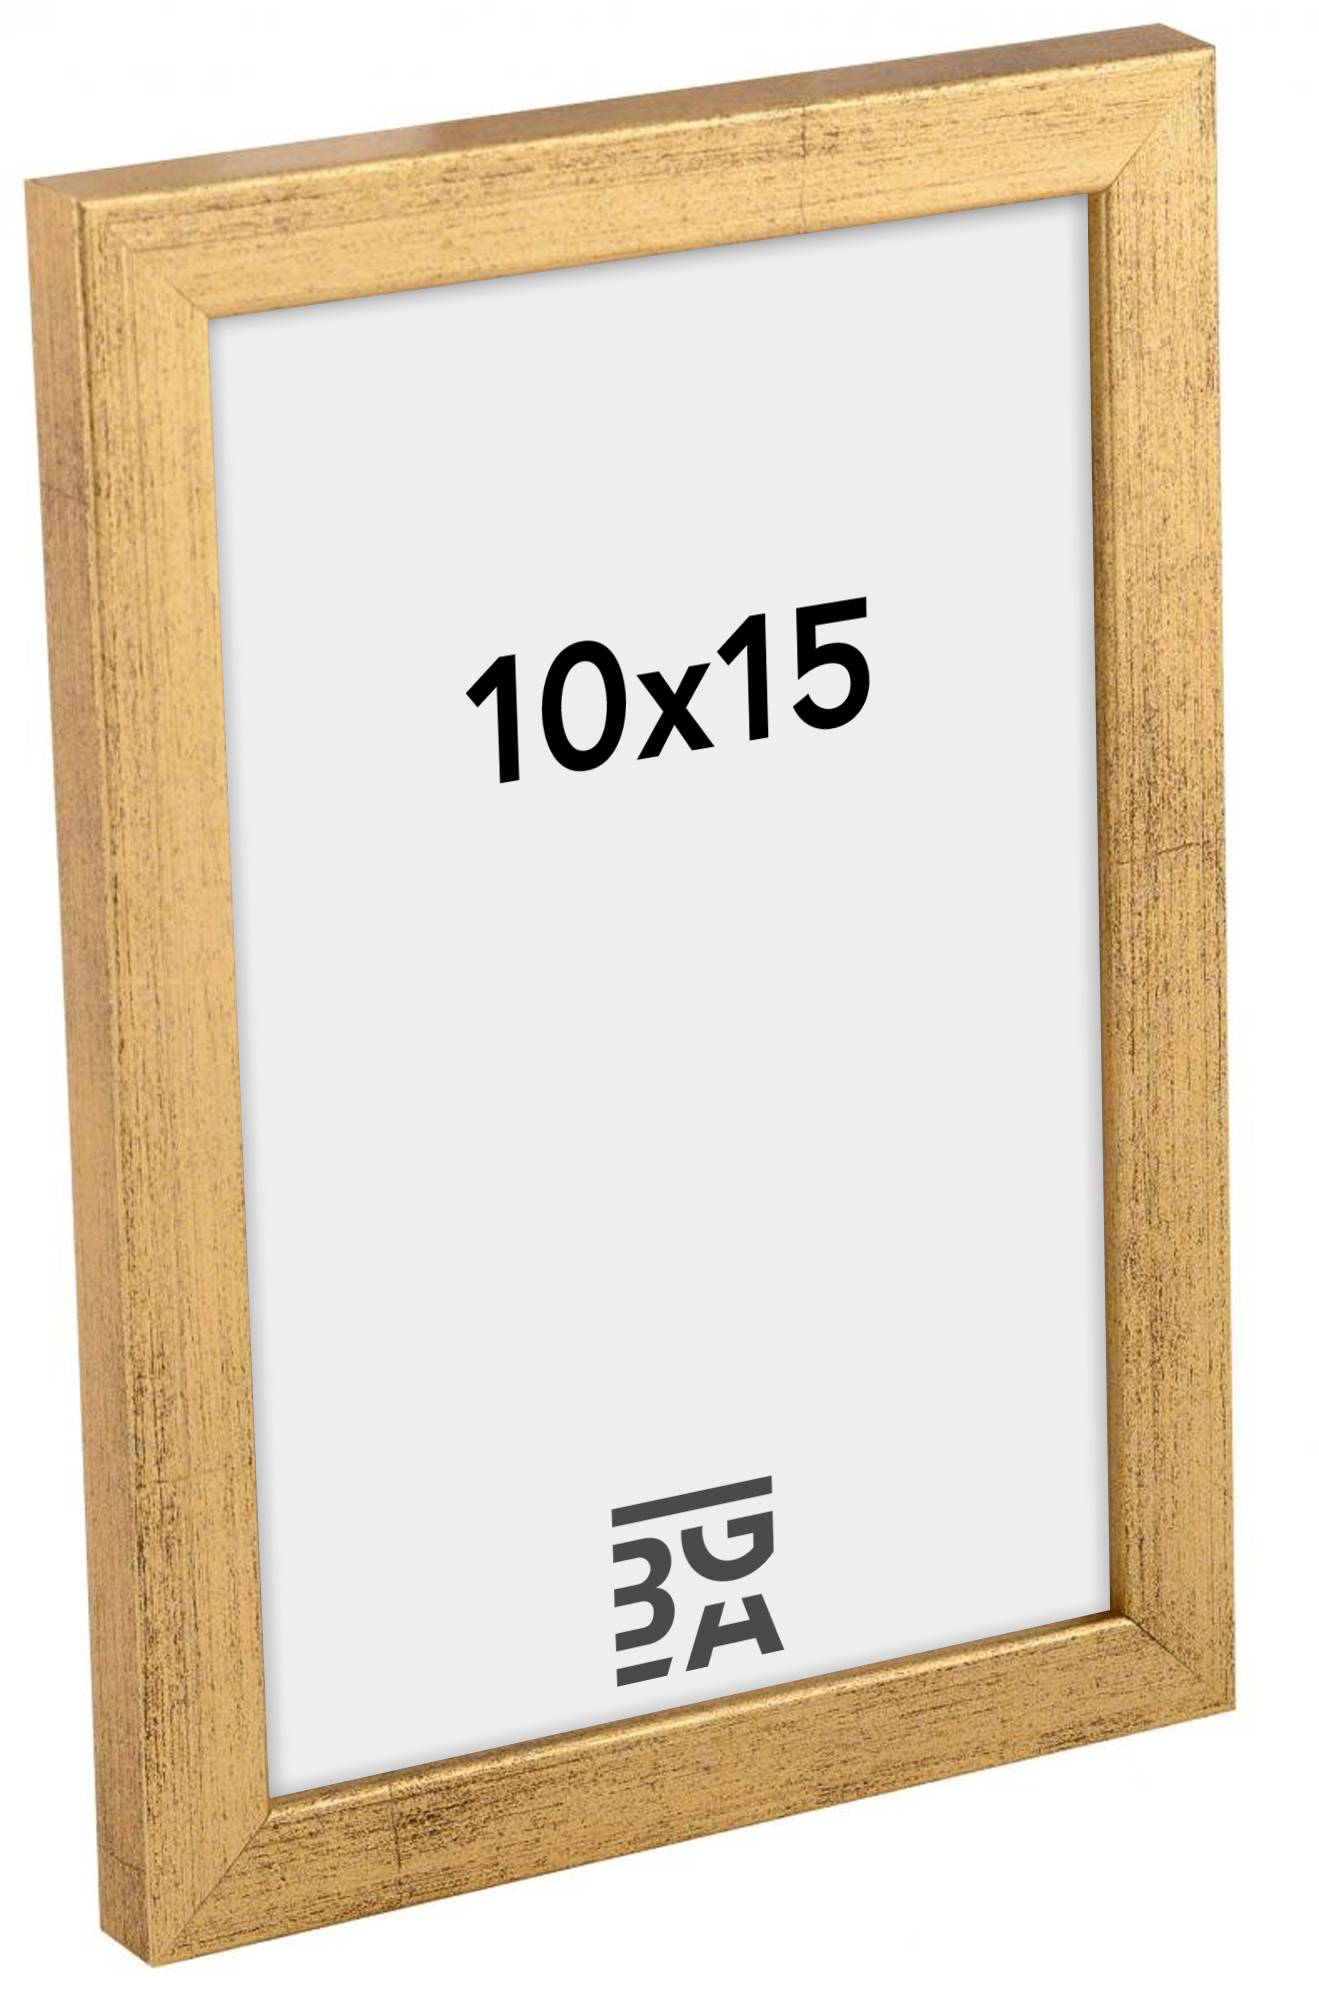 Estancia Galant Kullanvärinen 10x15 cm